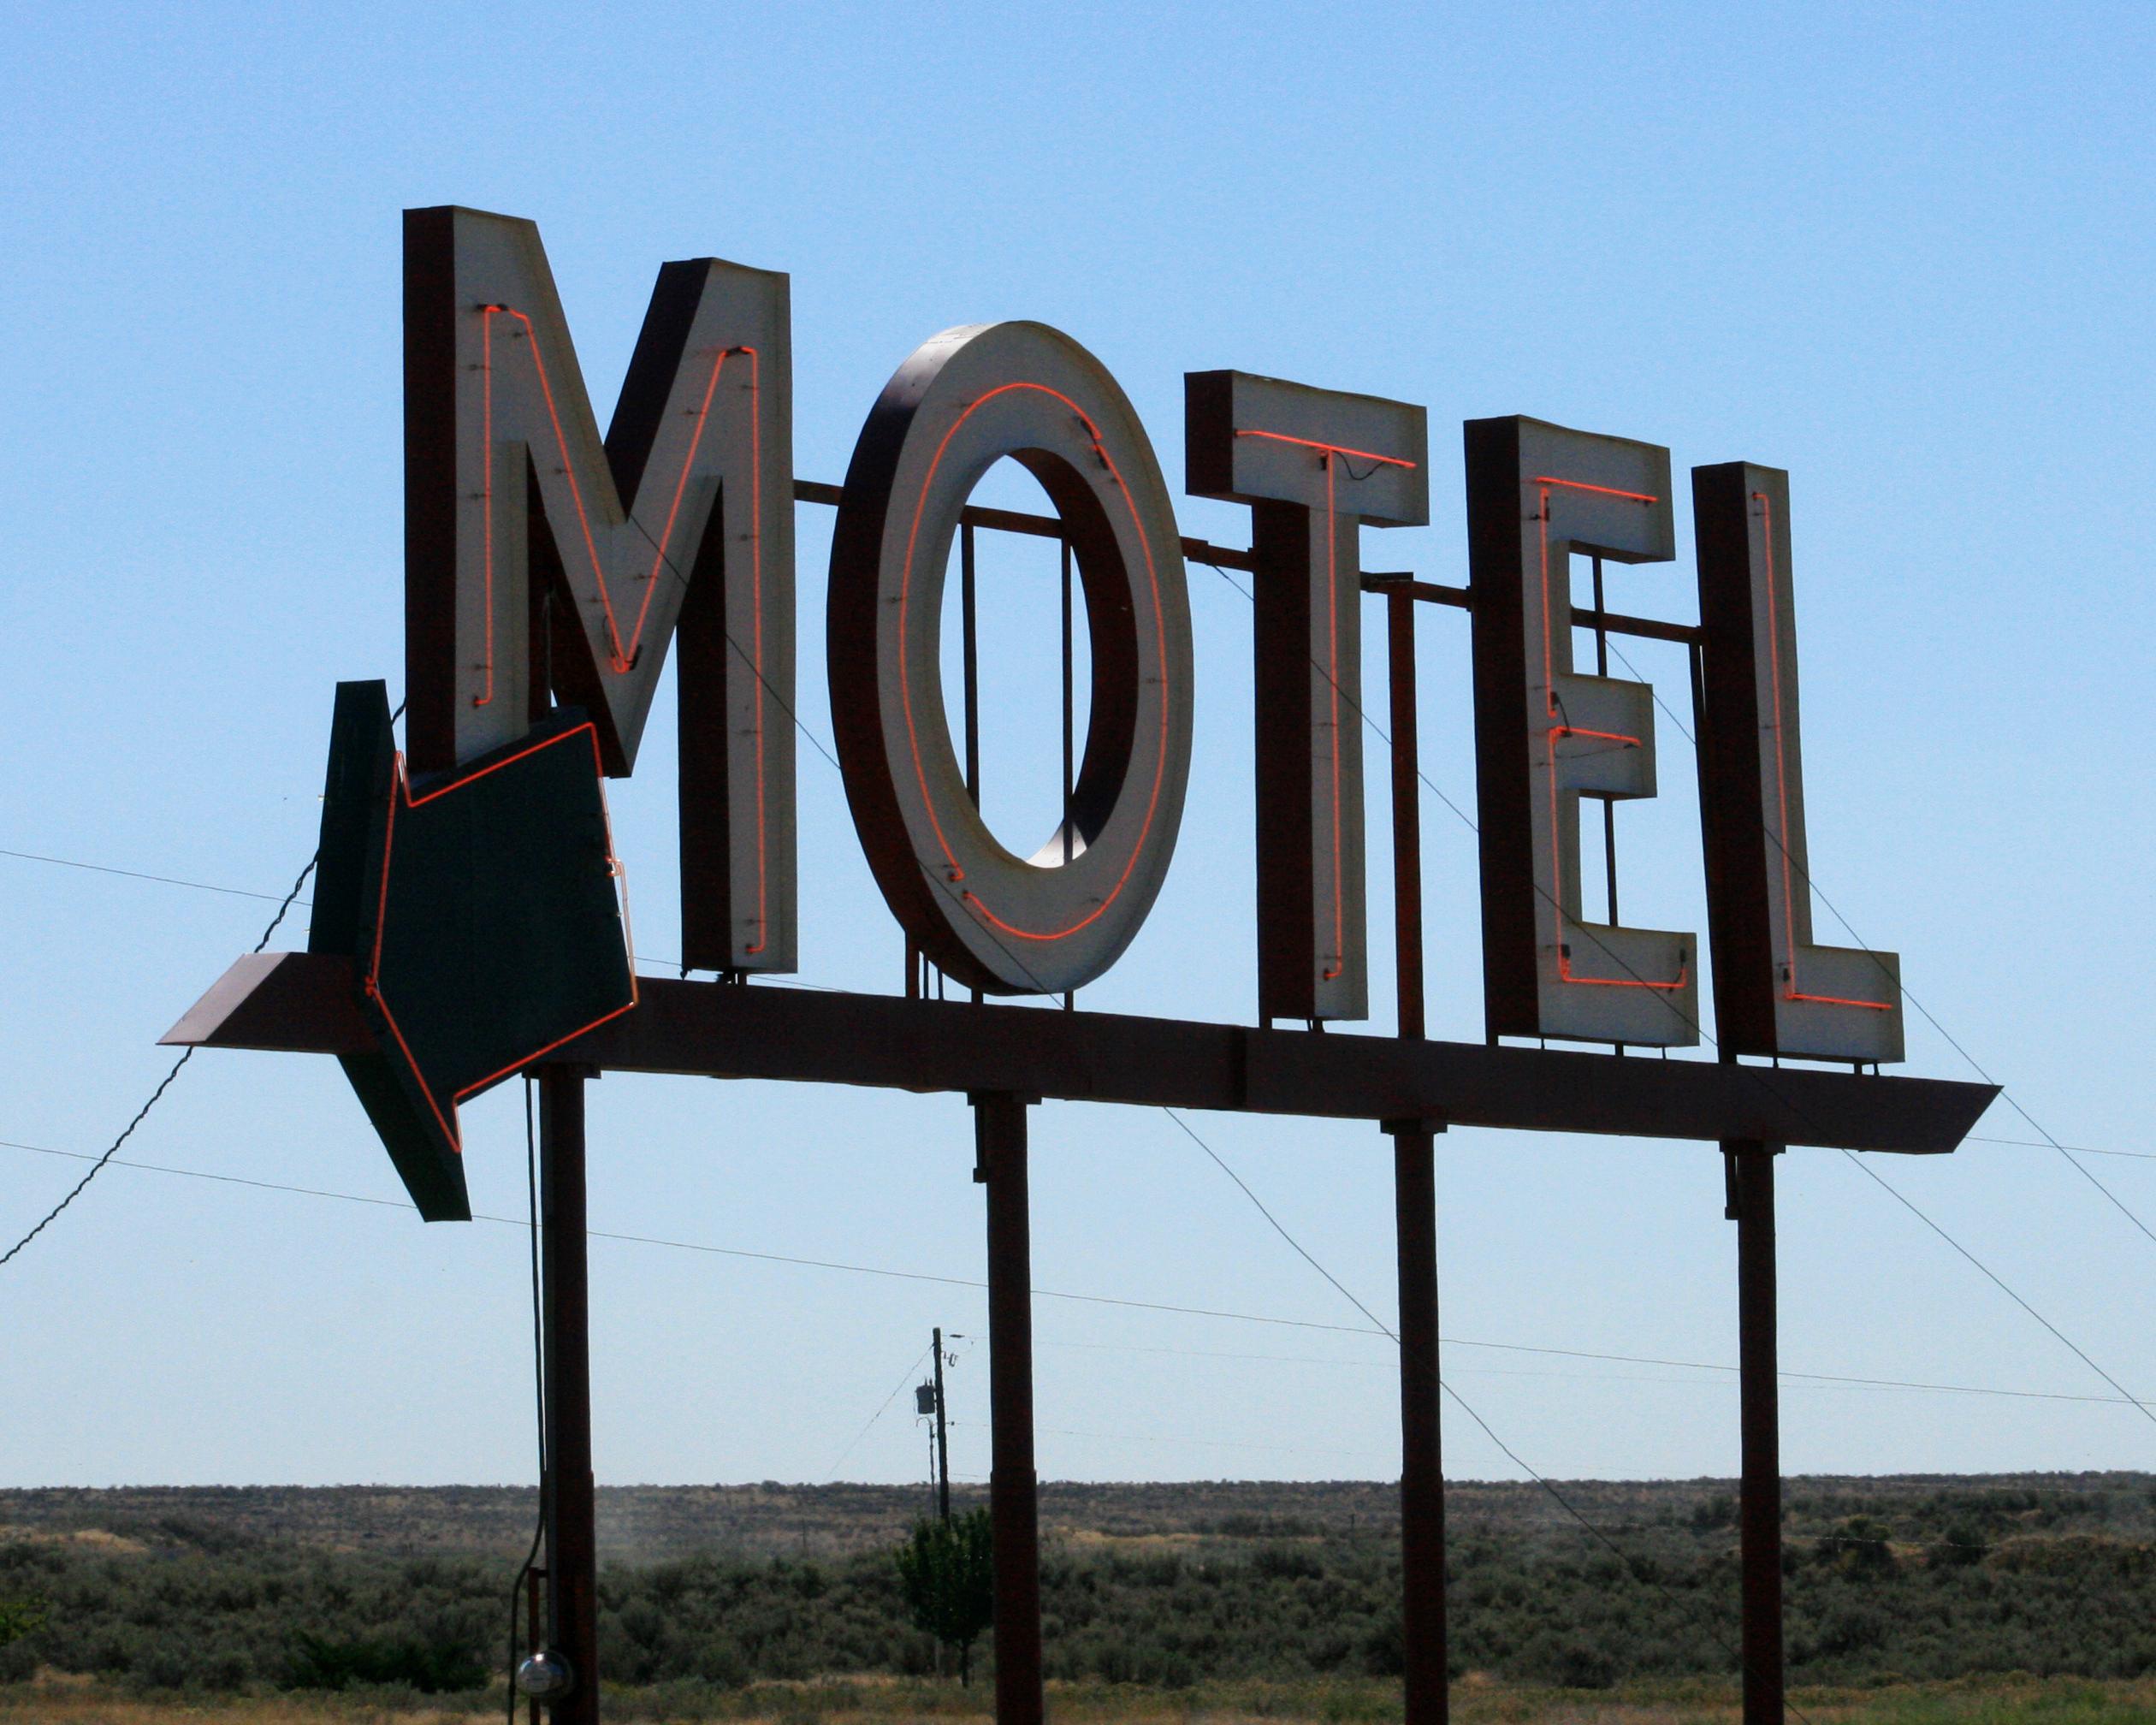 Beginner Friendly Motel Business For Sale